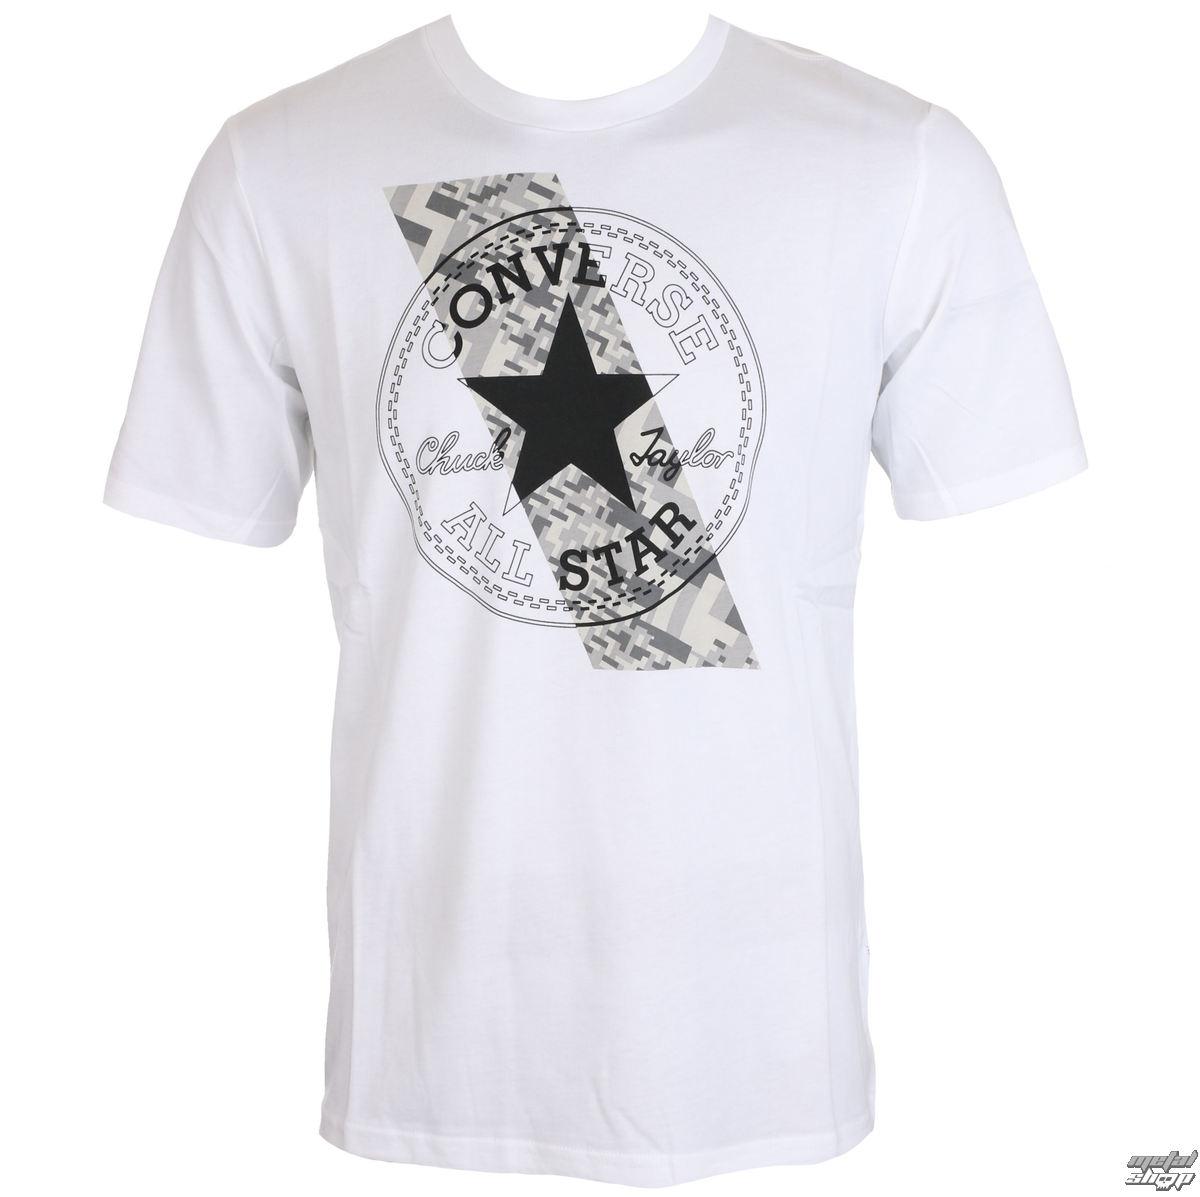 f54a2ba0f9375 tričko pánské CONVERSE - Chuckptch Contrast Slash - 10004727-A04 ...